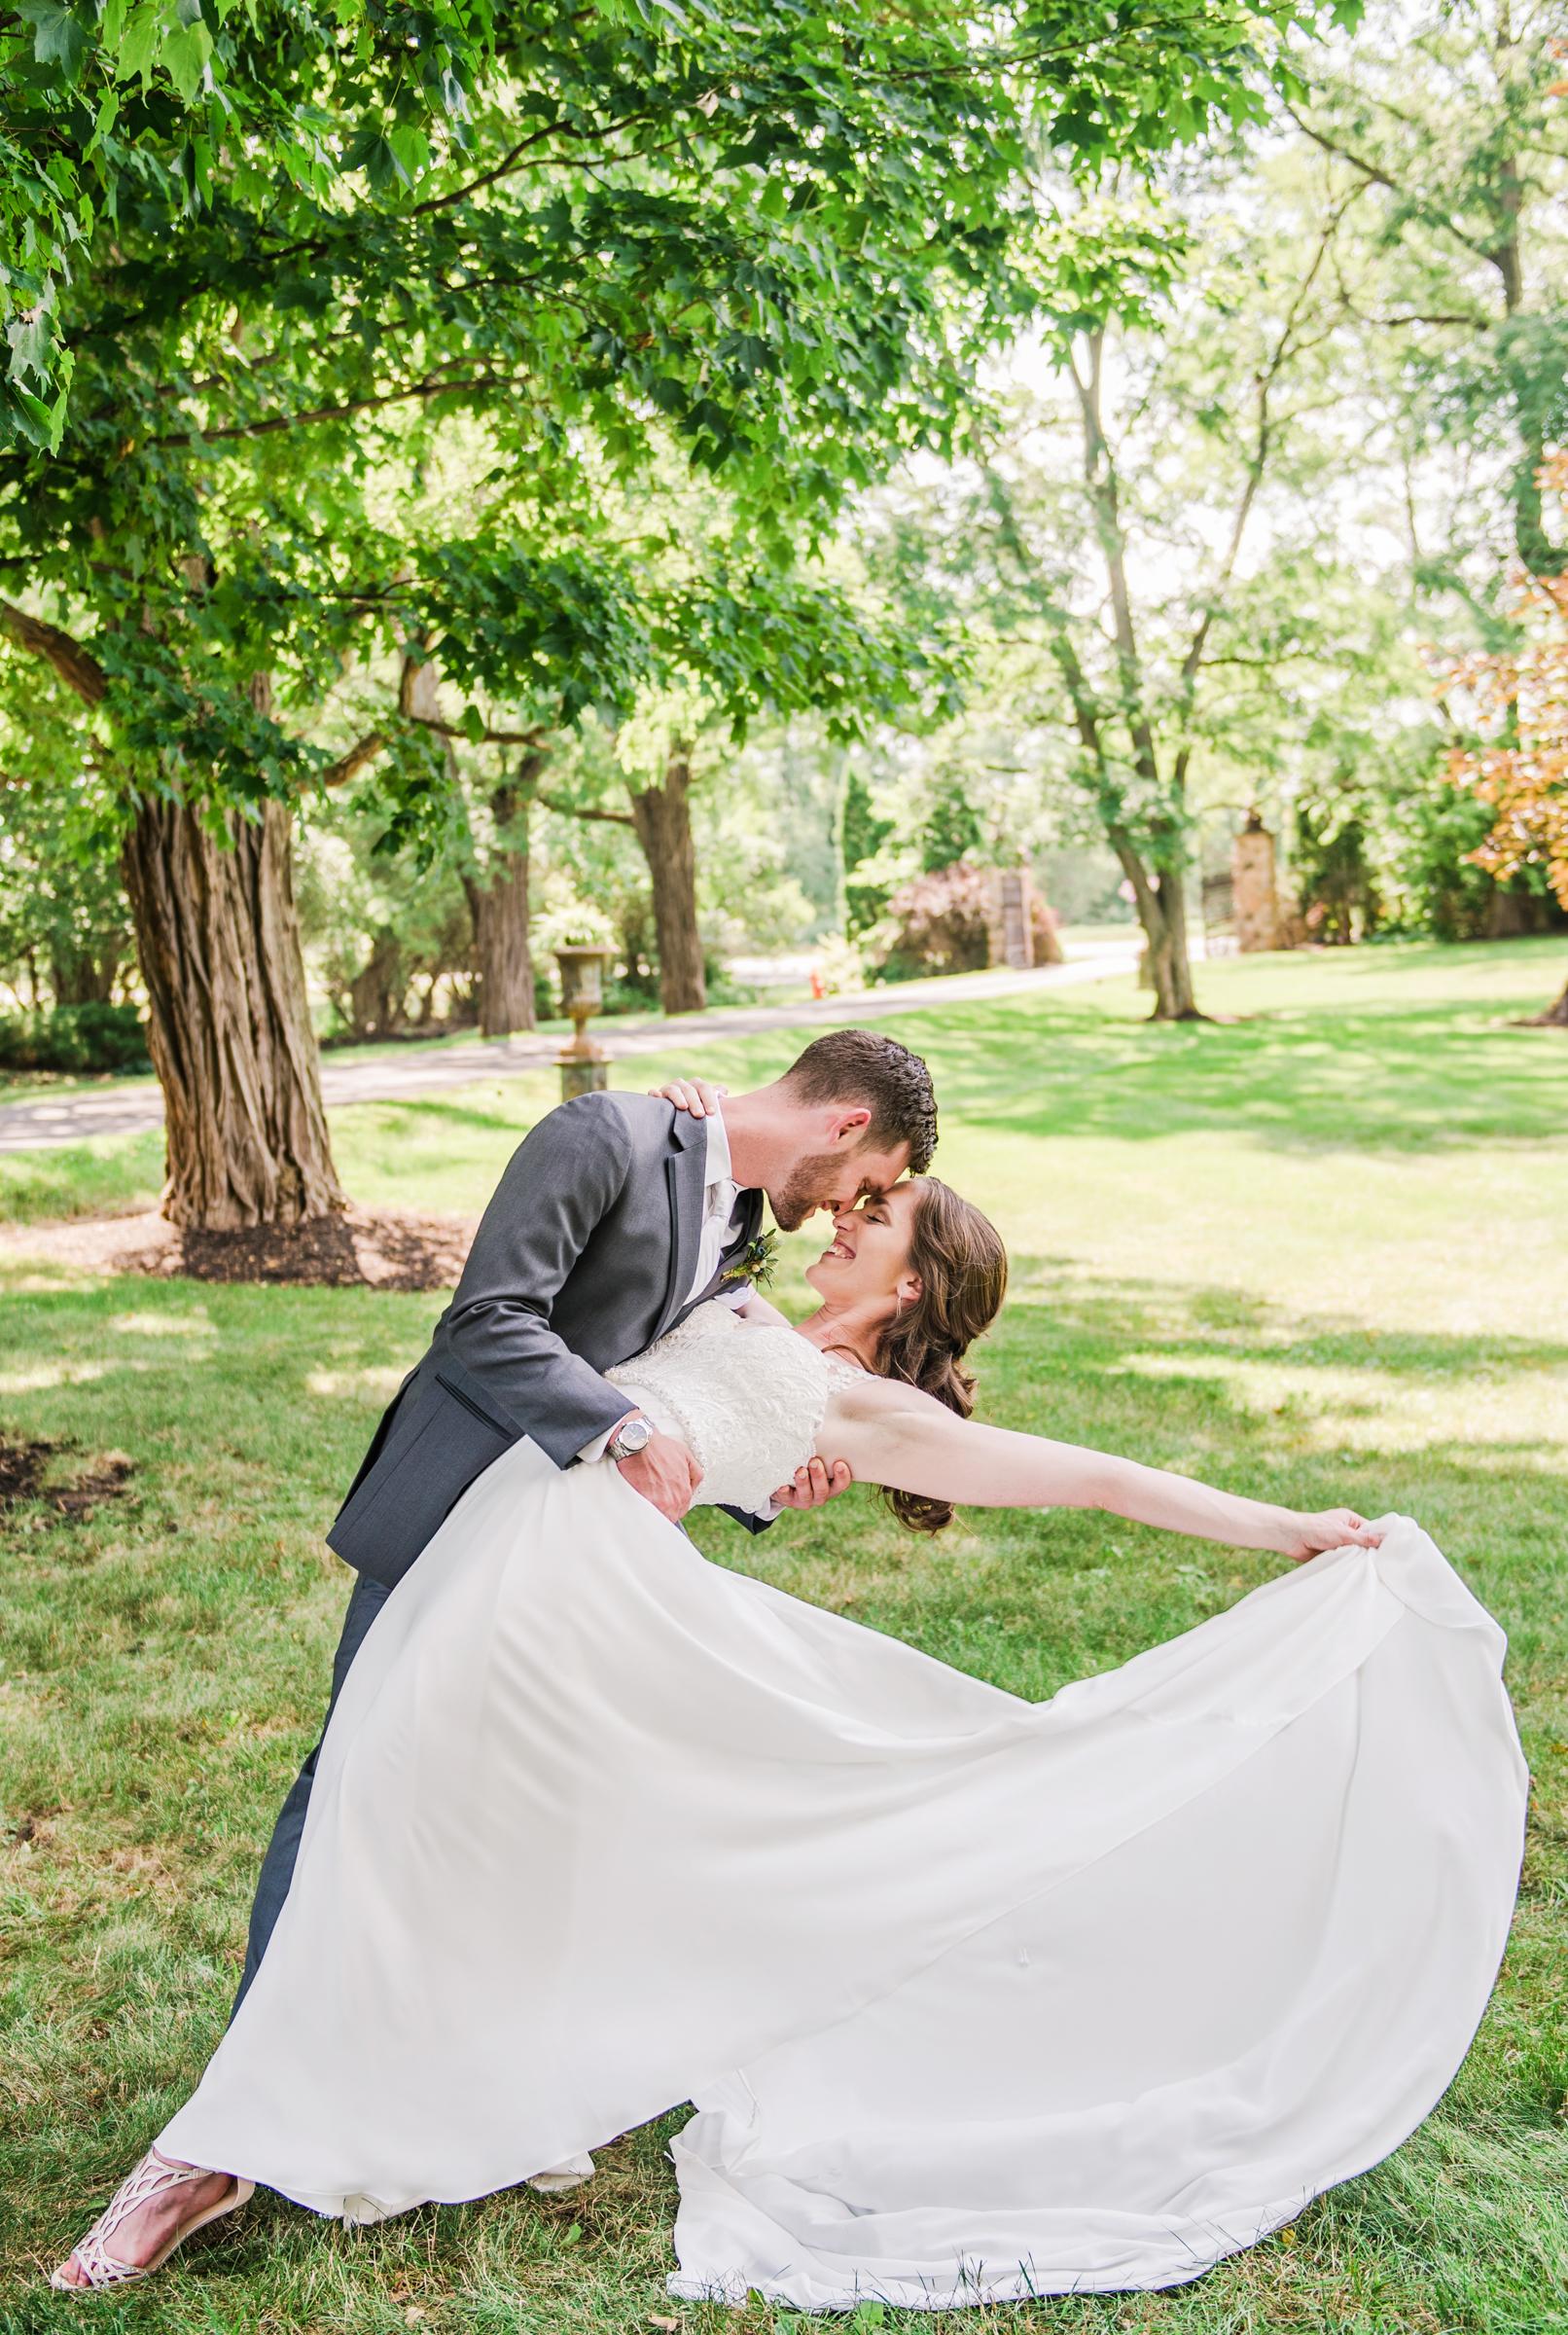 Jerris_Wadsworth_Wedding_Barn_Rochester_Wedding_JILL_STUDIO_Rochester_NY_Photographer_DSC_2442.jpg